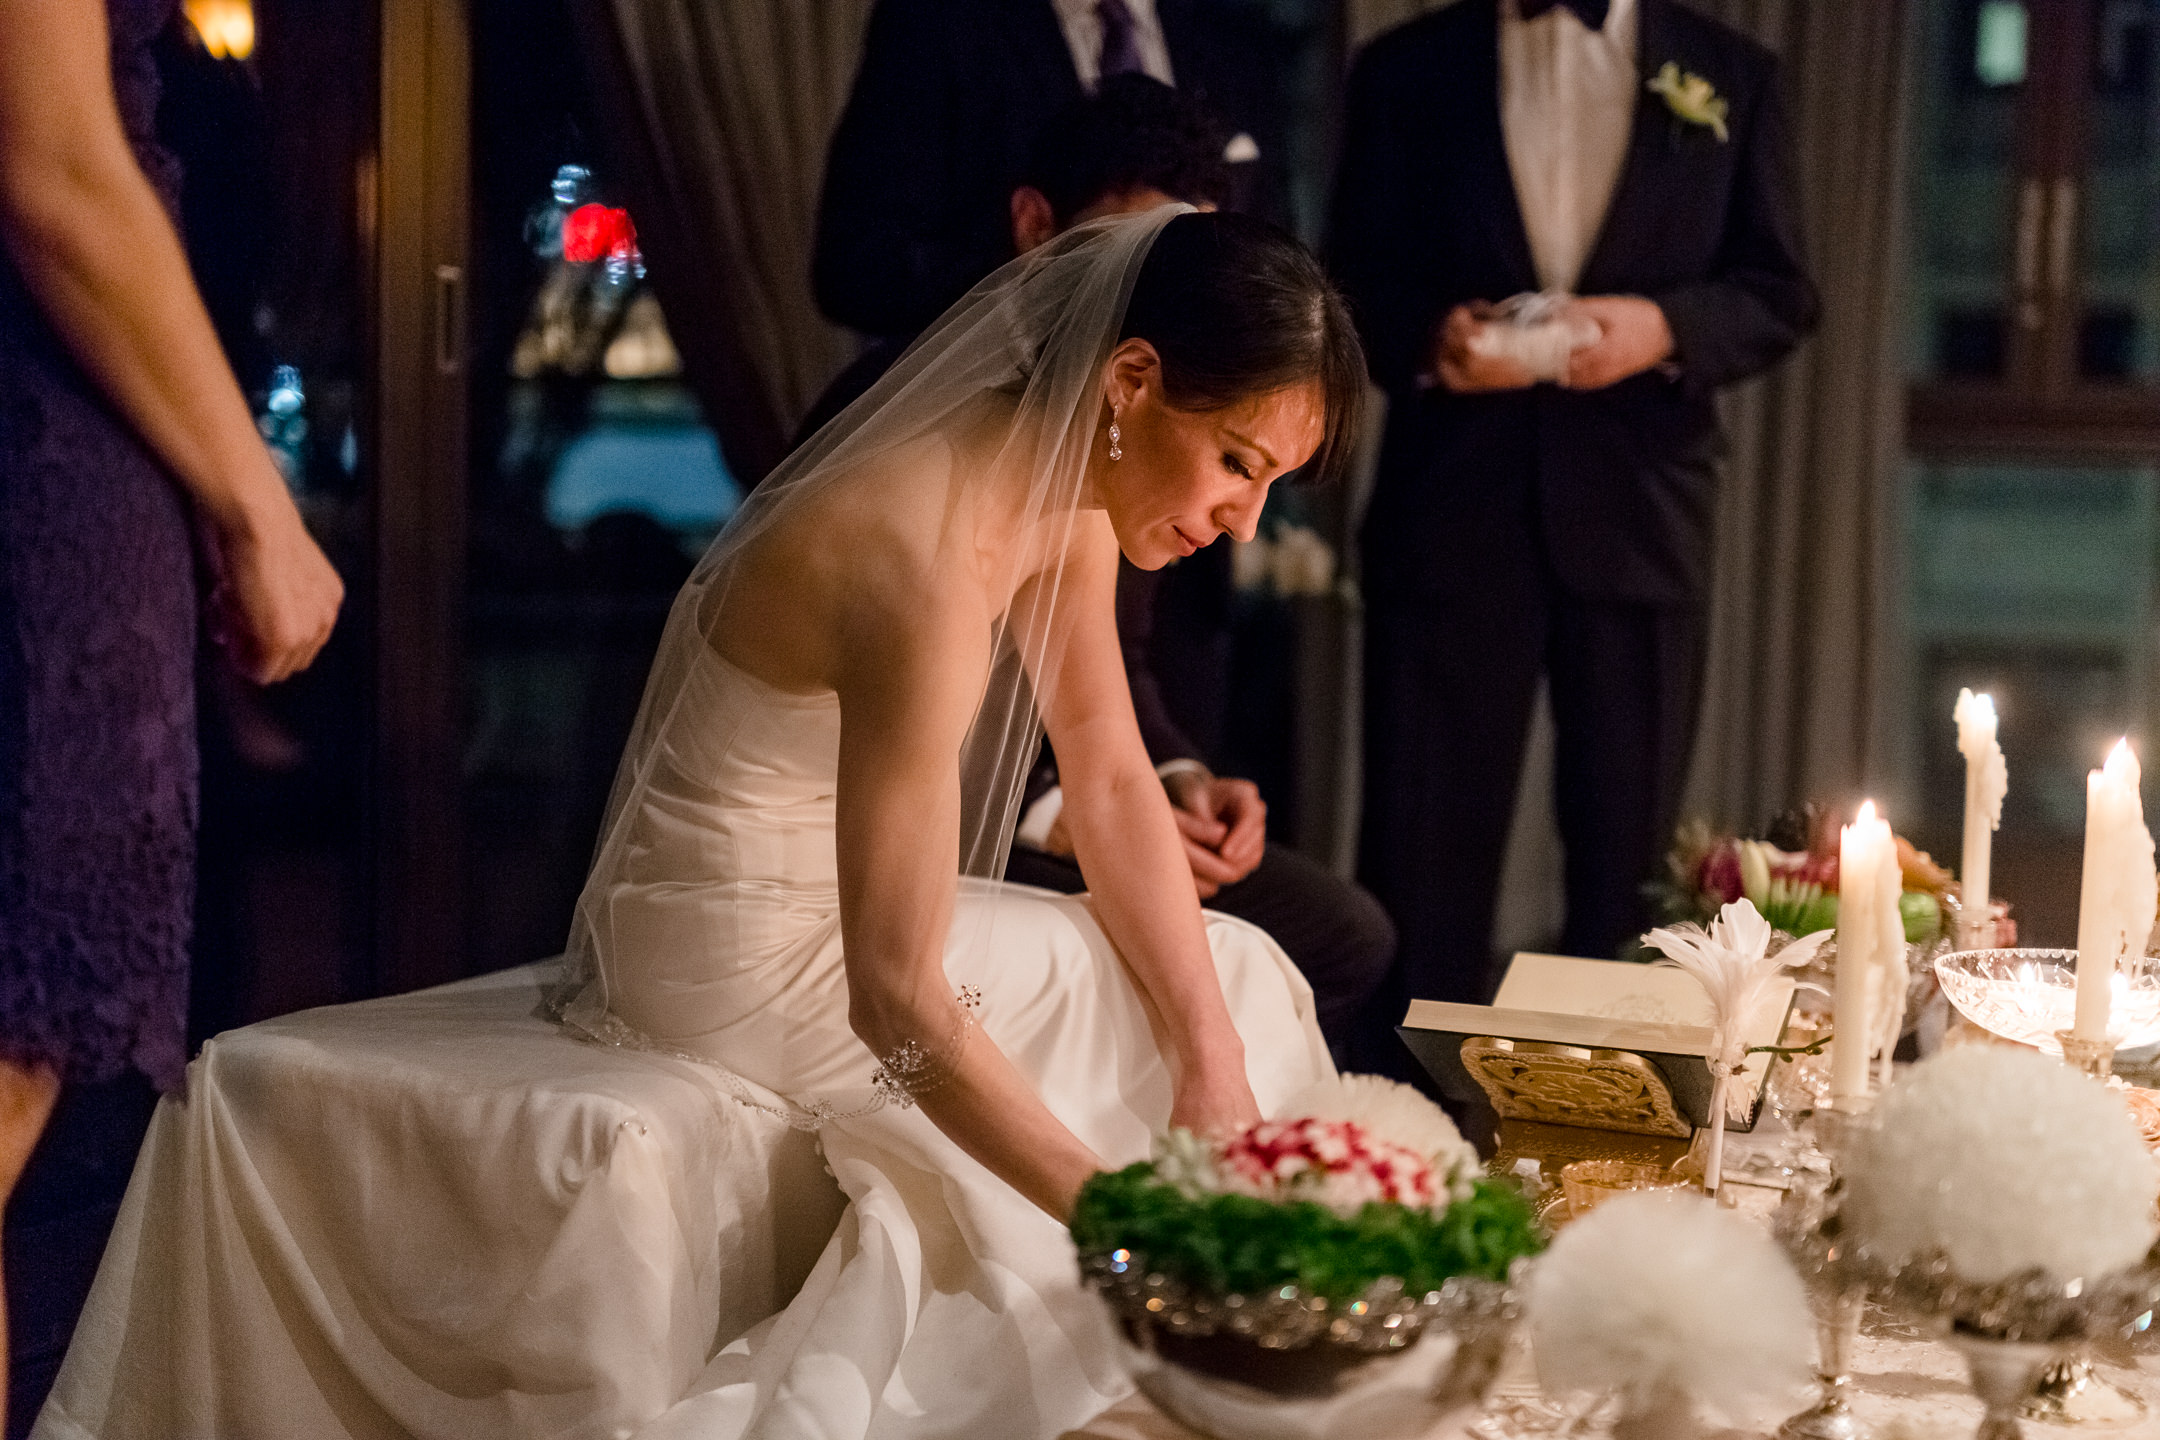 Documentary-Wedding-Photography-Andrew-Tat-Maria & AJ-24.jpg